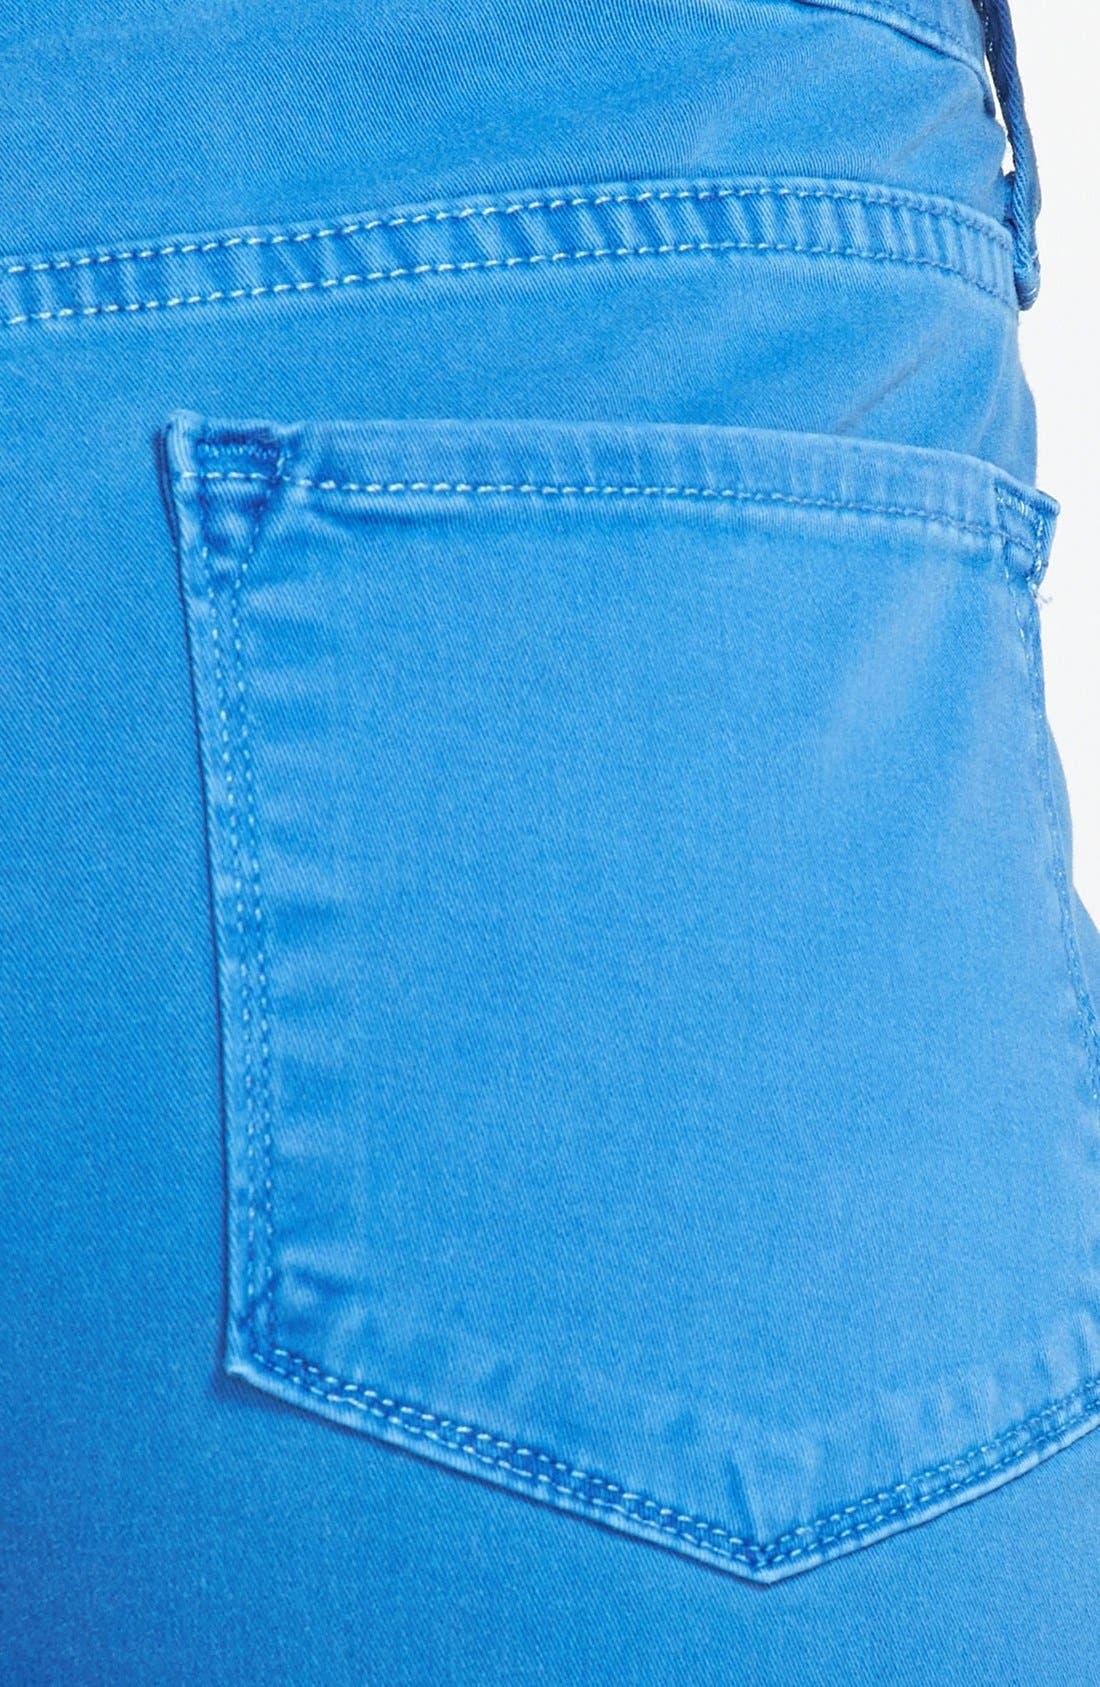 Alternate Image 3  - NYDJ 'Sheri' Colored Stretch Denim Skinny Jeans